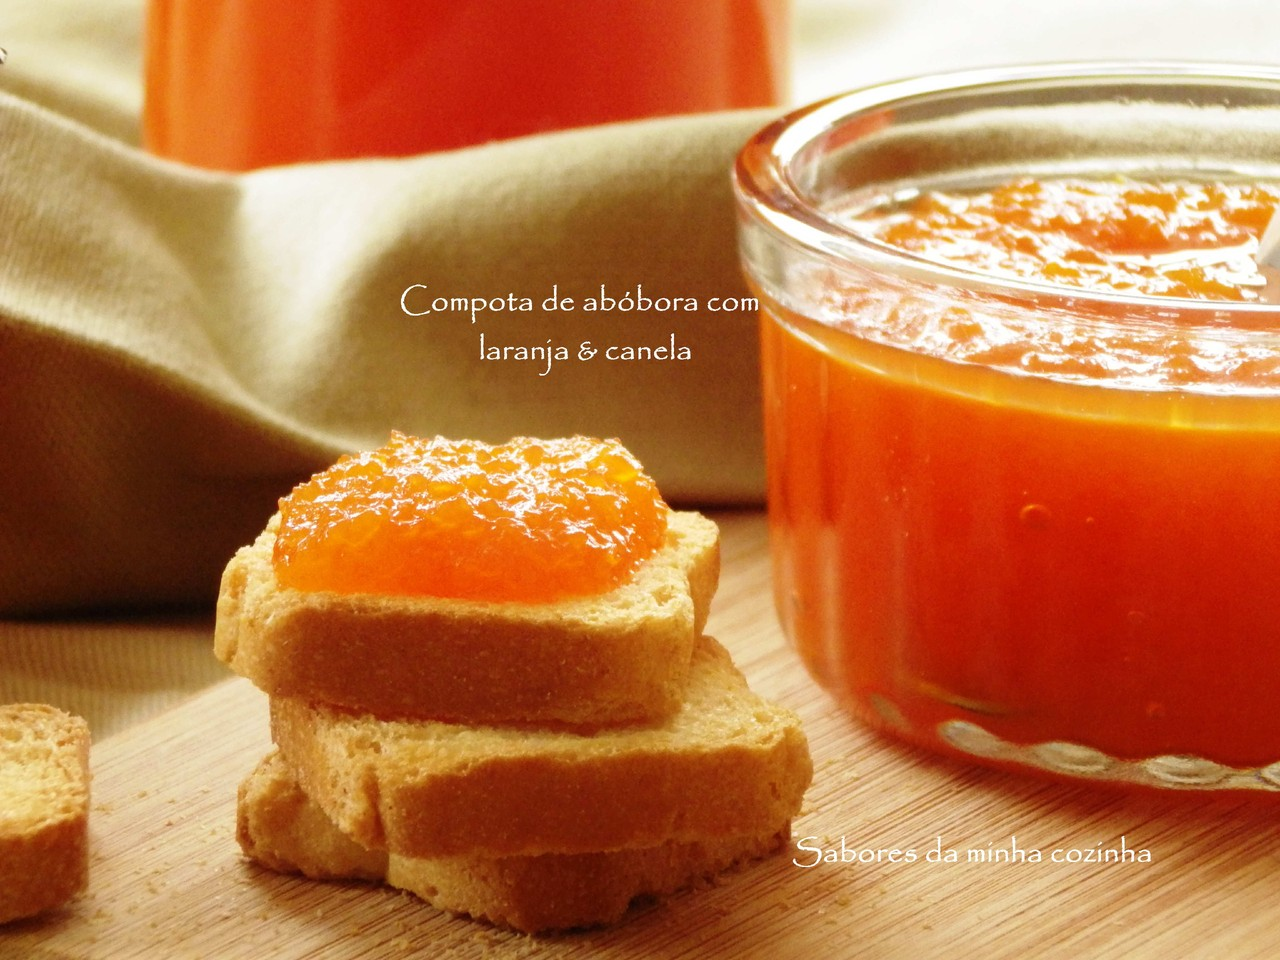 IMGP4308-Doce de abóbora com laranja e canela-Blo